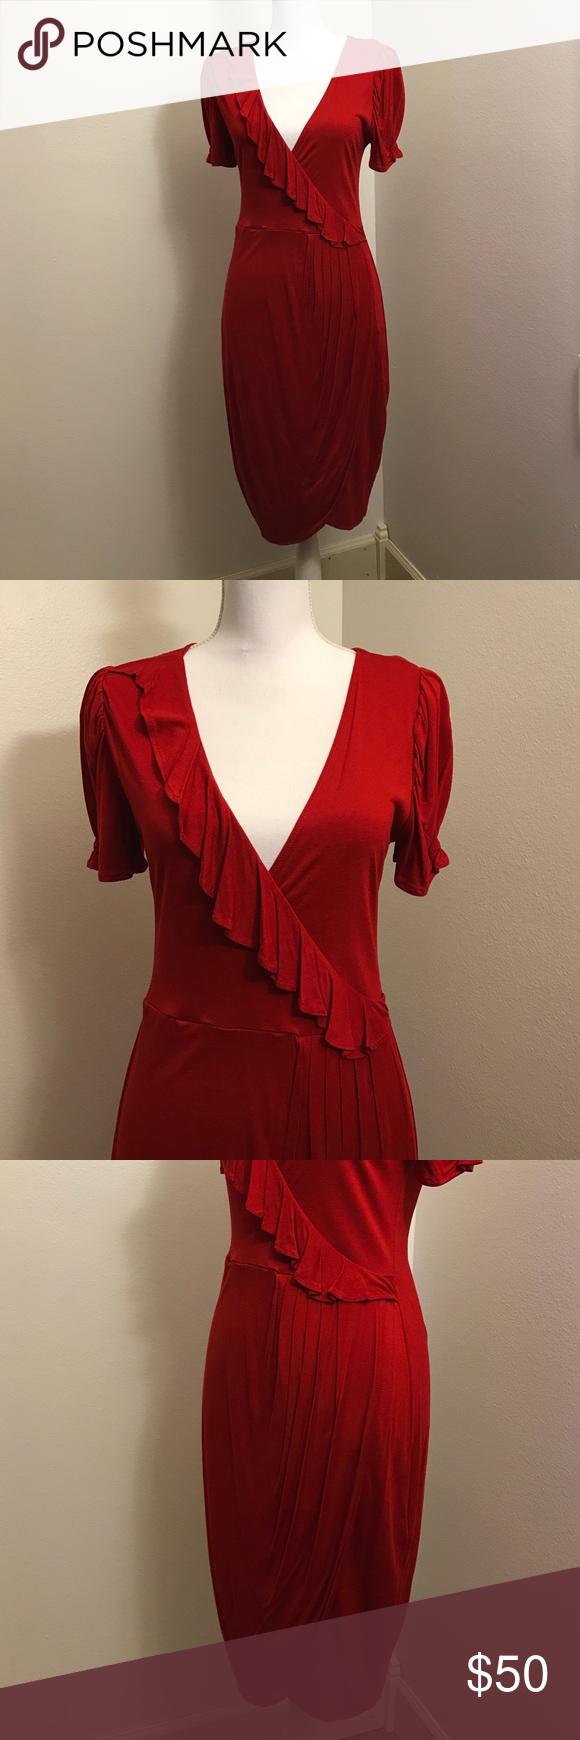 Zara red dress with ruffle zara dresses zara red dress and collection